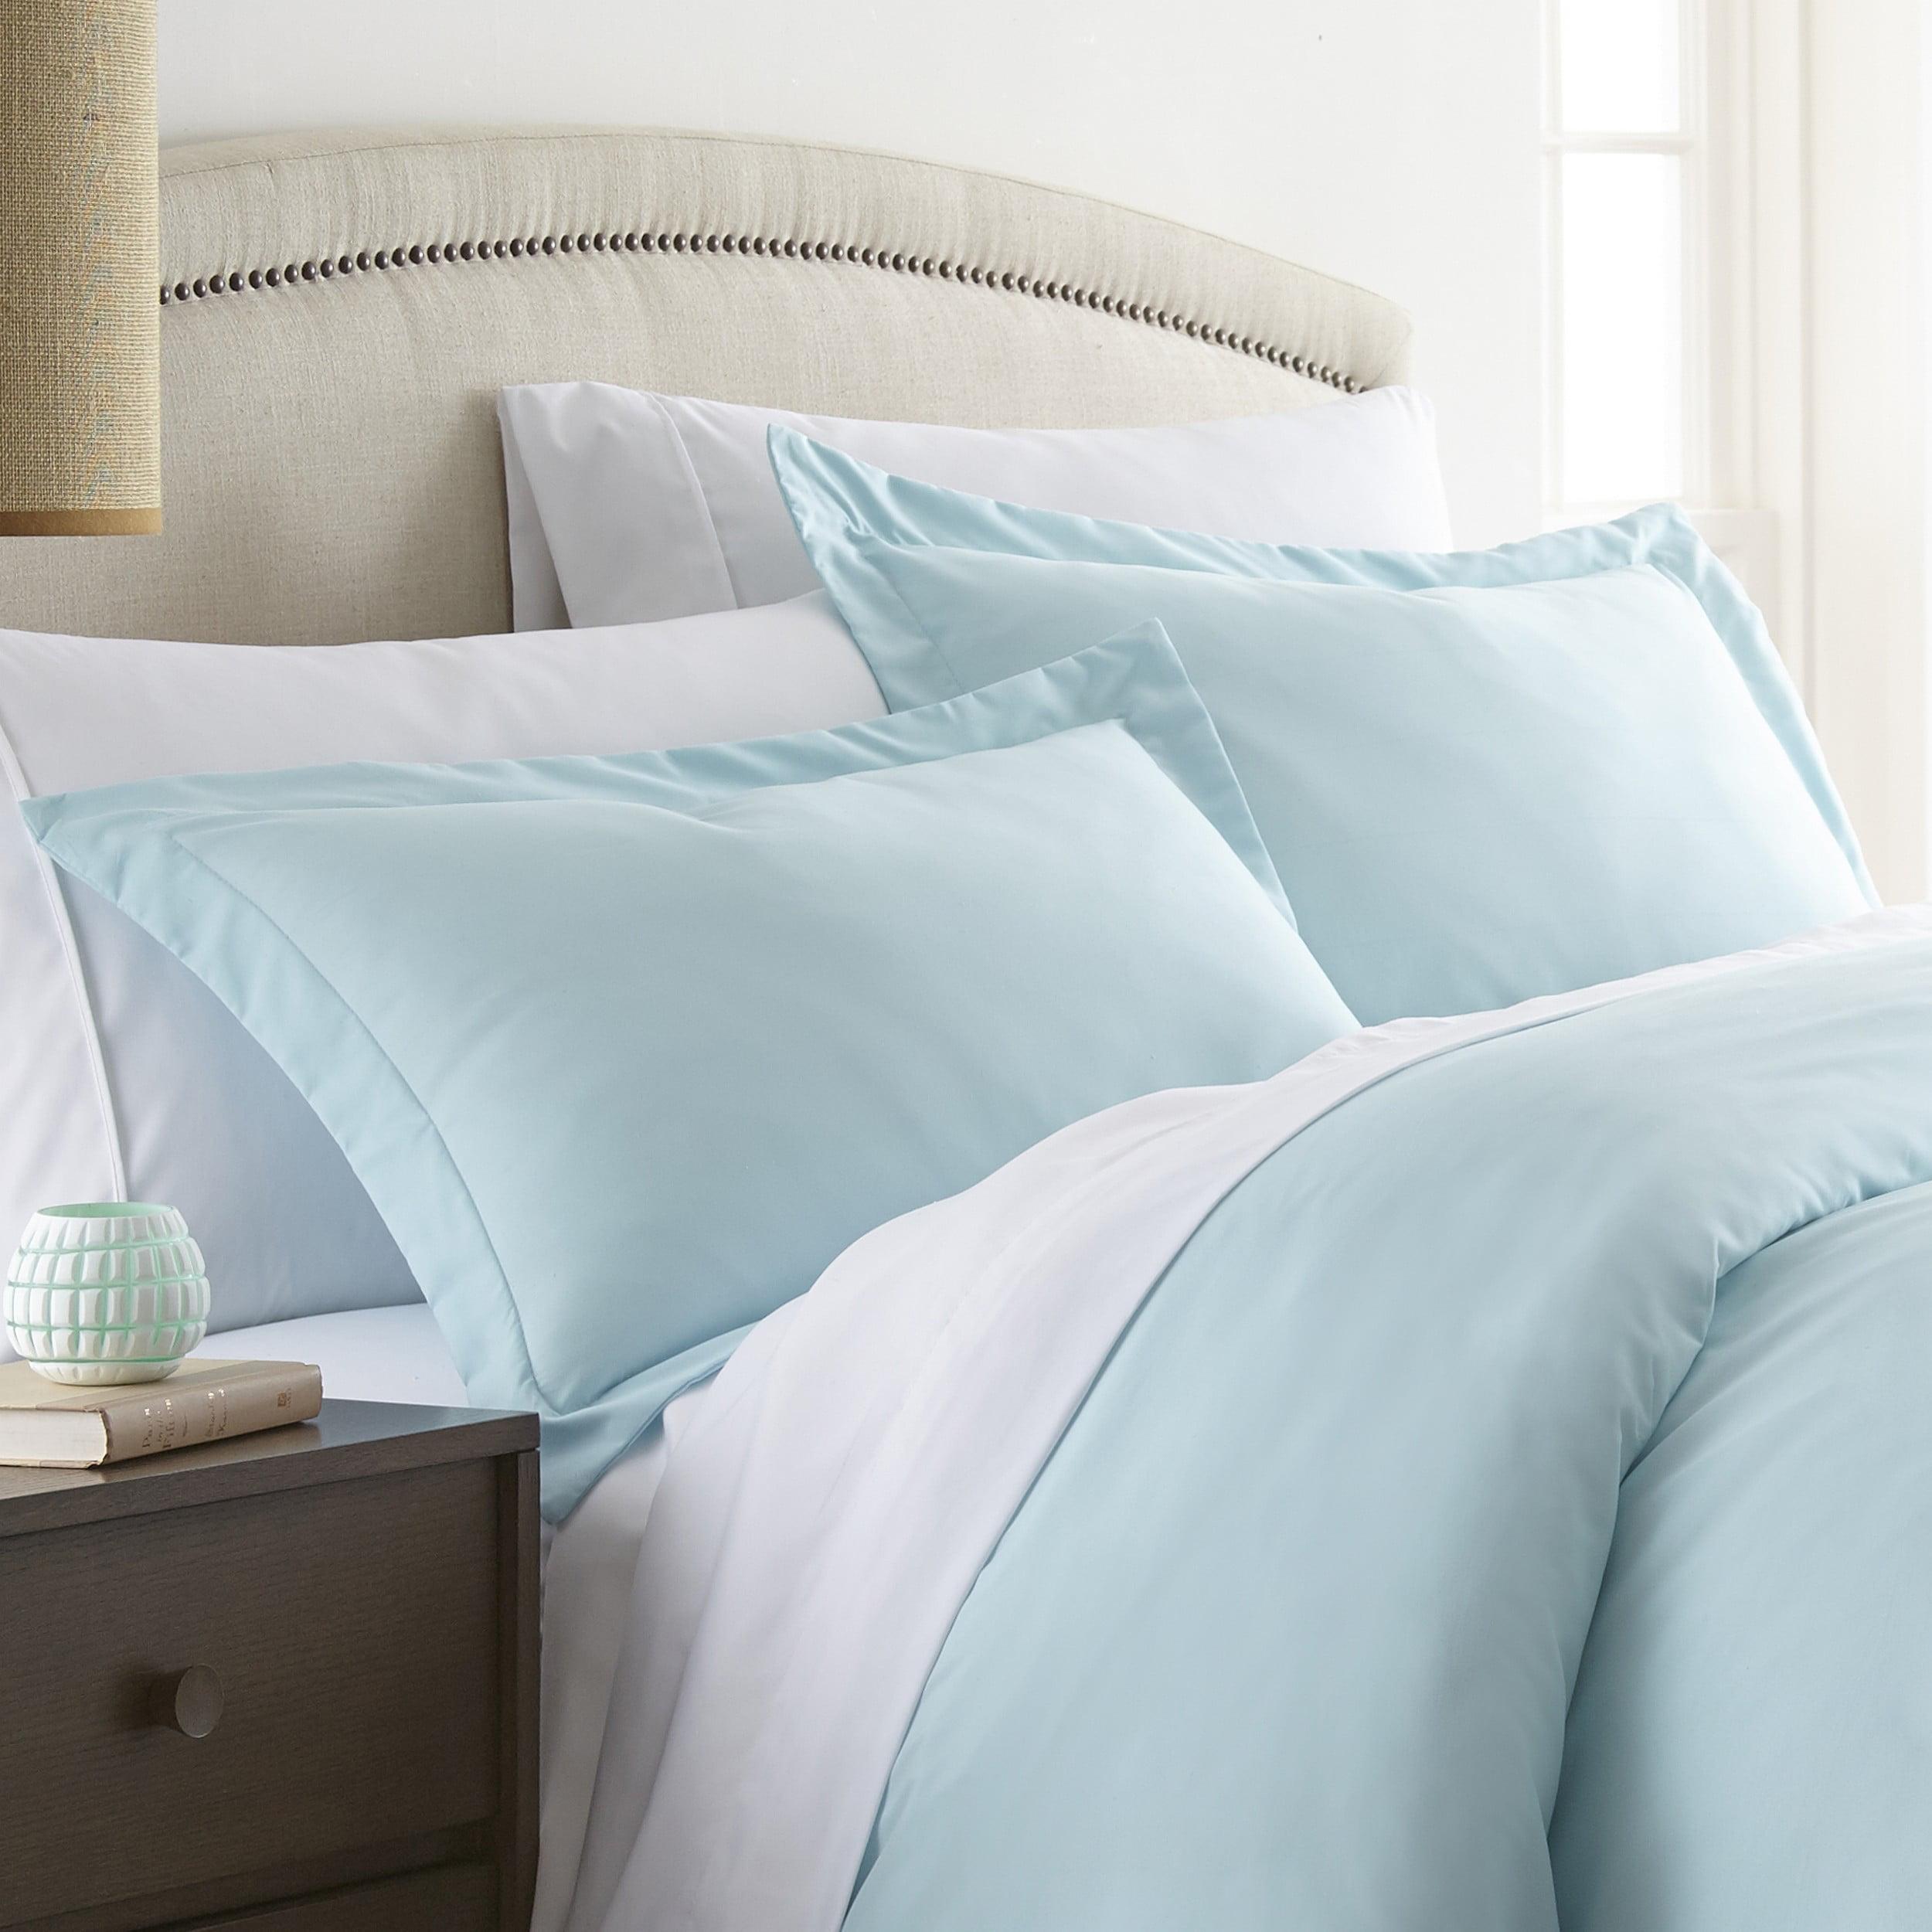 The Pillow Collection Xylon Geometric Bedding Sham Orange Queen//20 x 30